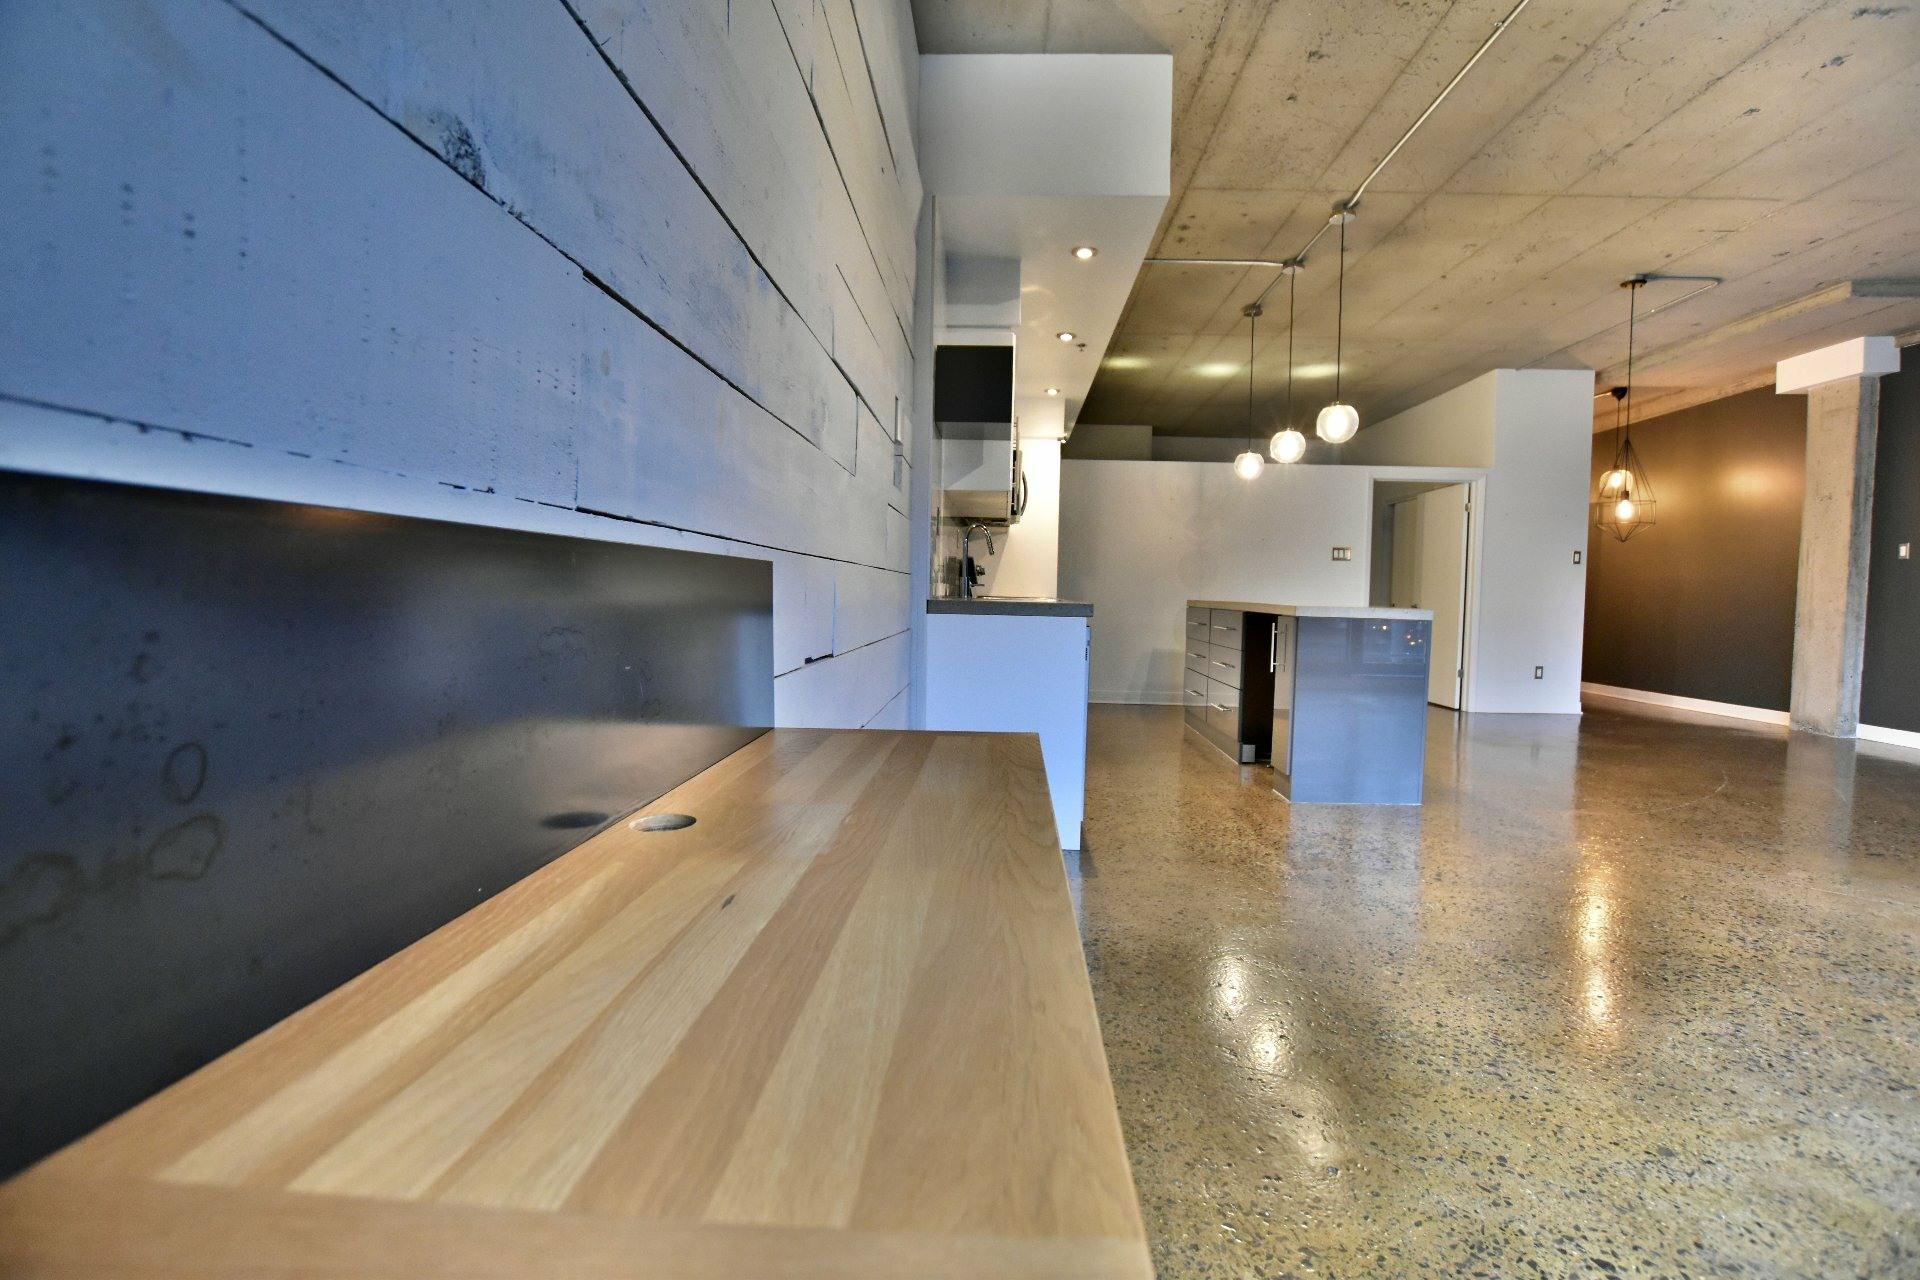 image 41 - Departamento Para alquiler Villeray/Saint-Michel/Parc-Extension Montréal  - 5 habitaciones